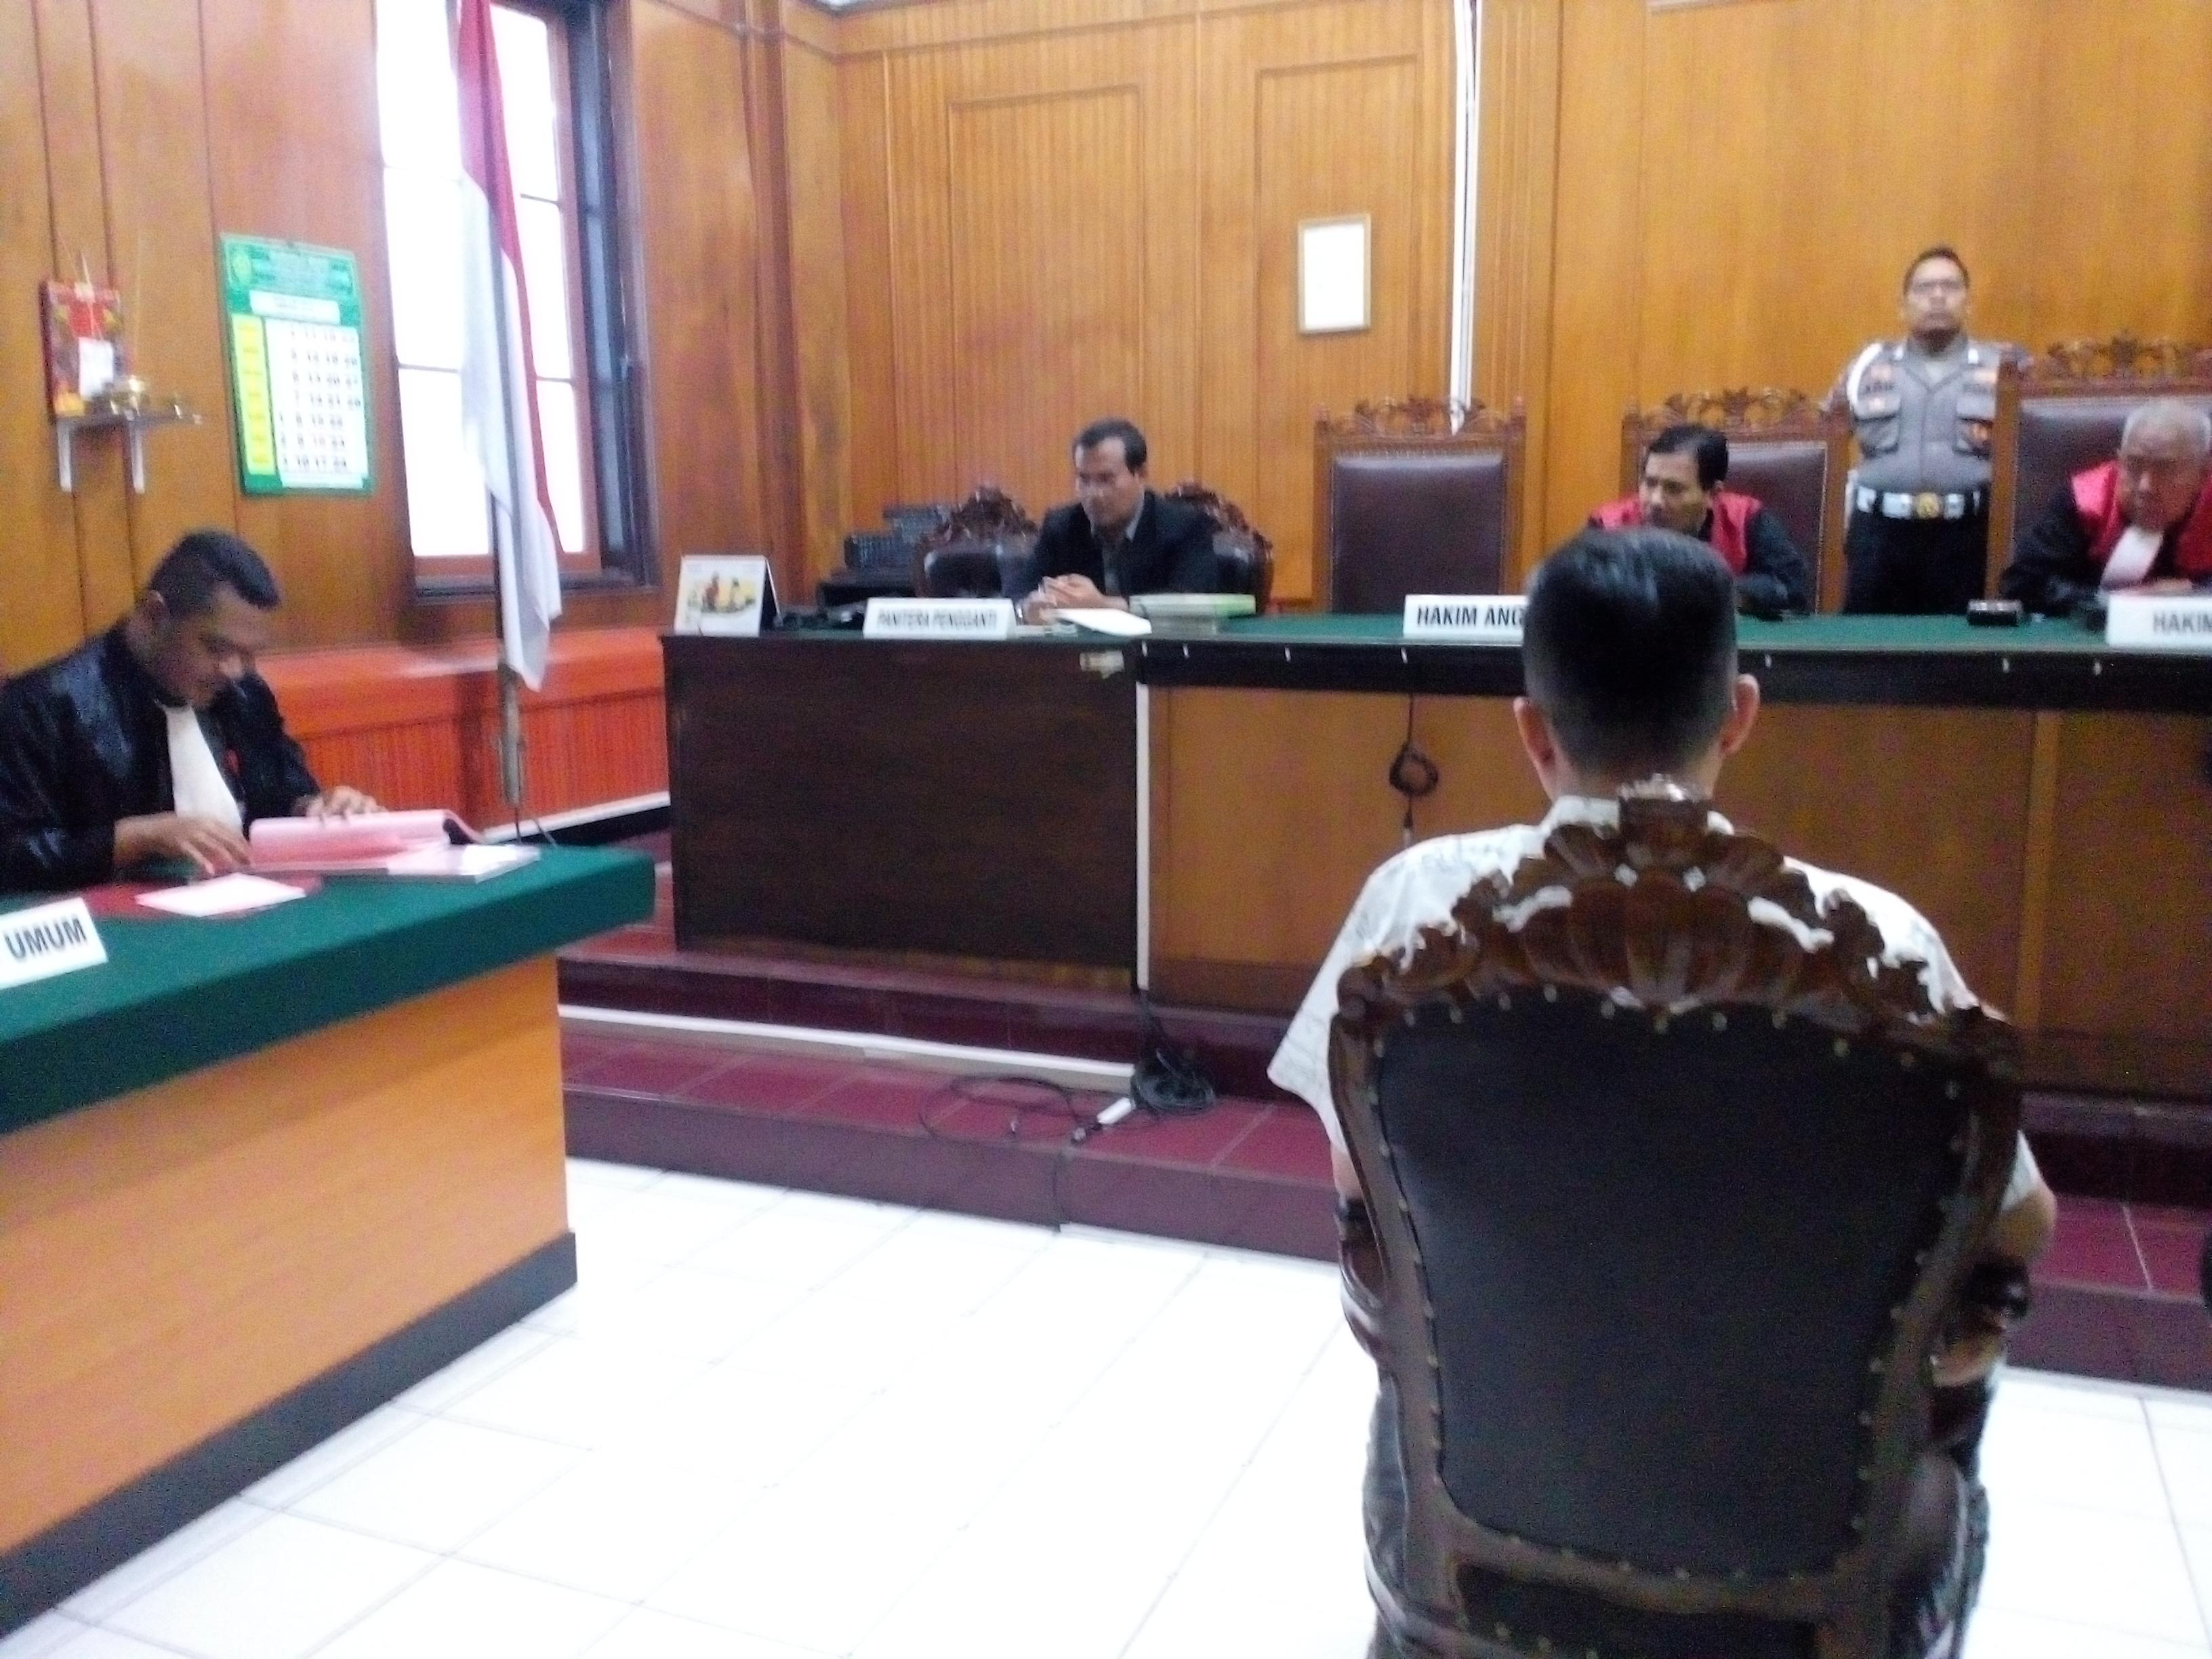 Akibat Terbukti Menipu Jaksa Tuntut Henry J Gunawan 4 Tahun  # Muebles Coarte Manta